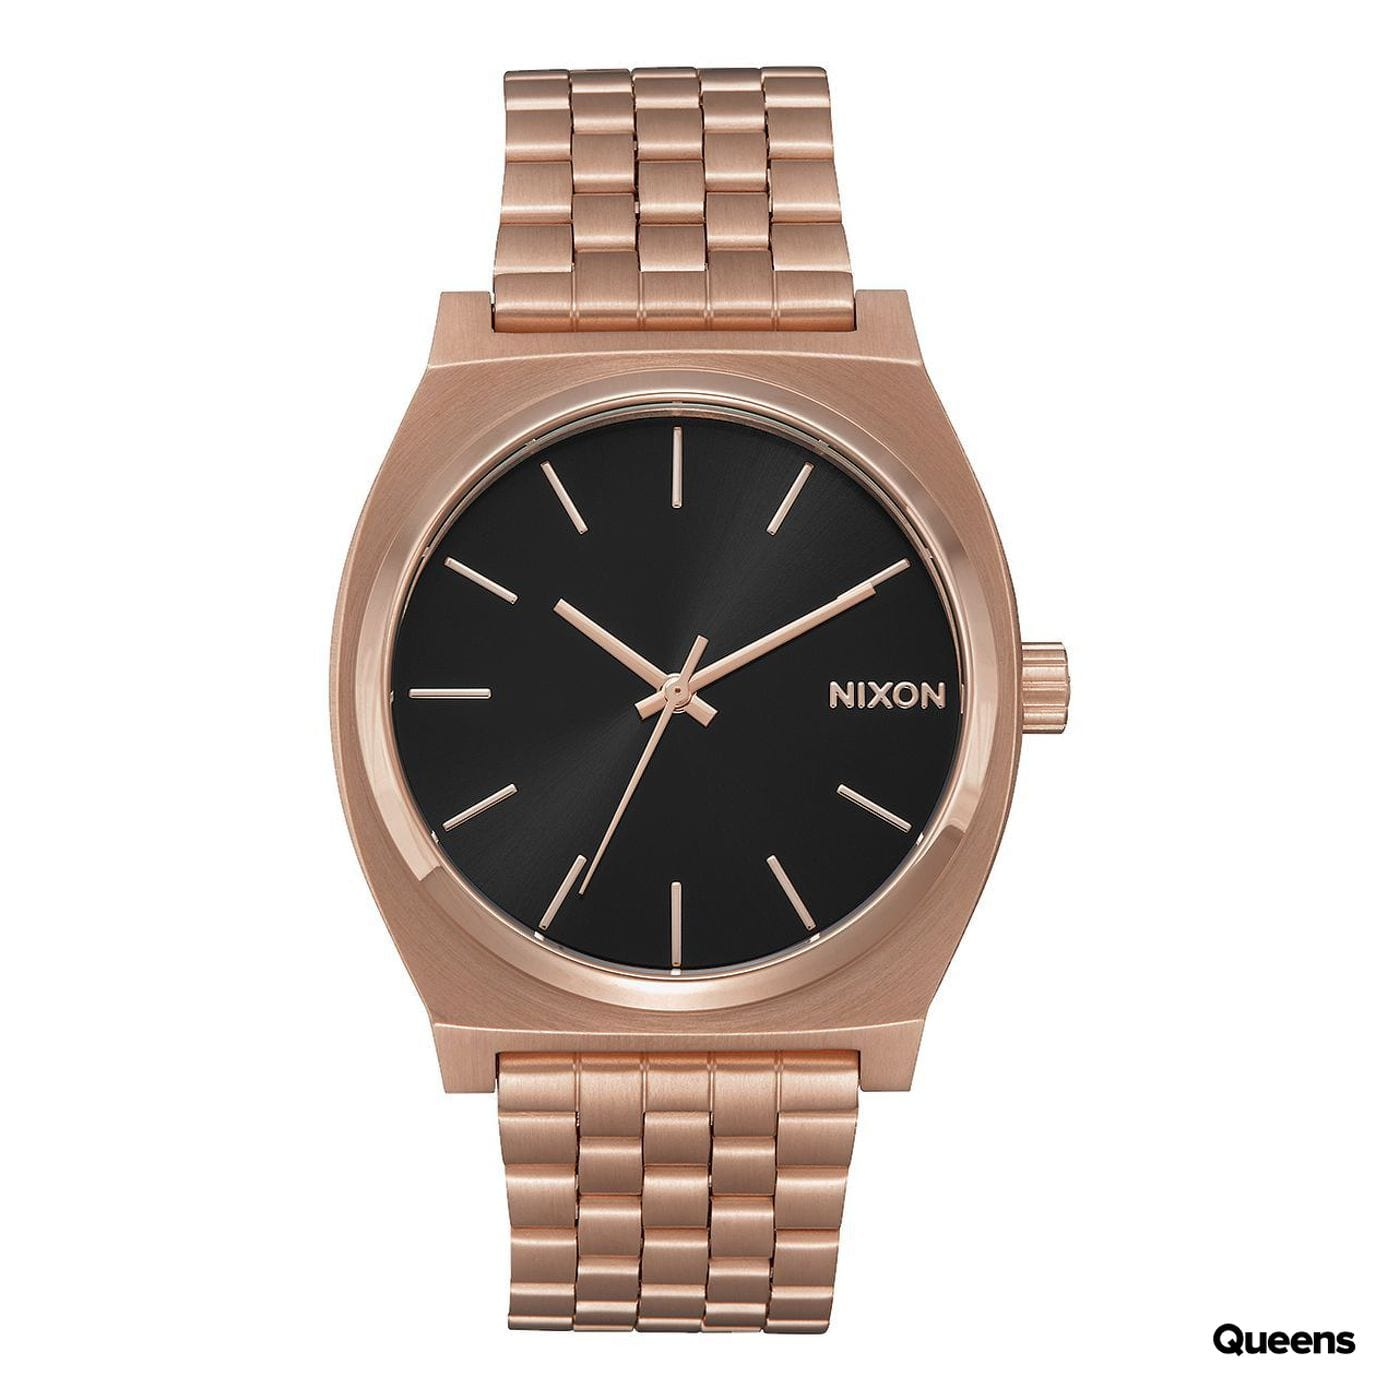 Nixon Time Teller roségold / schwarz